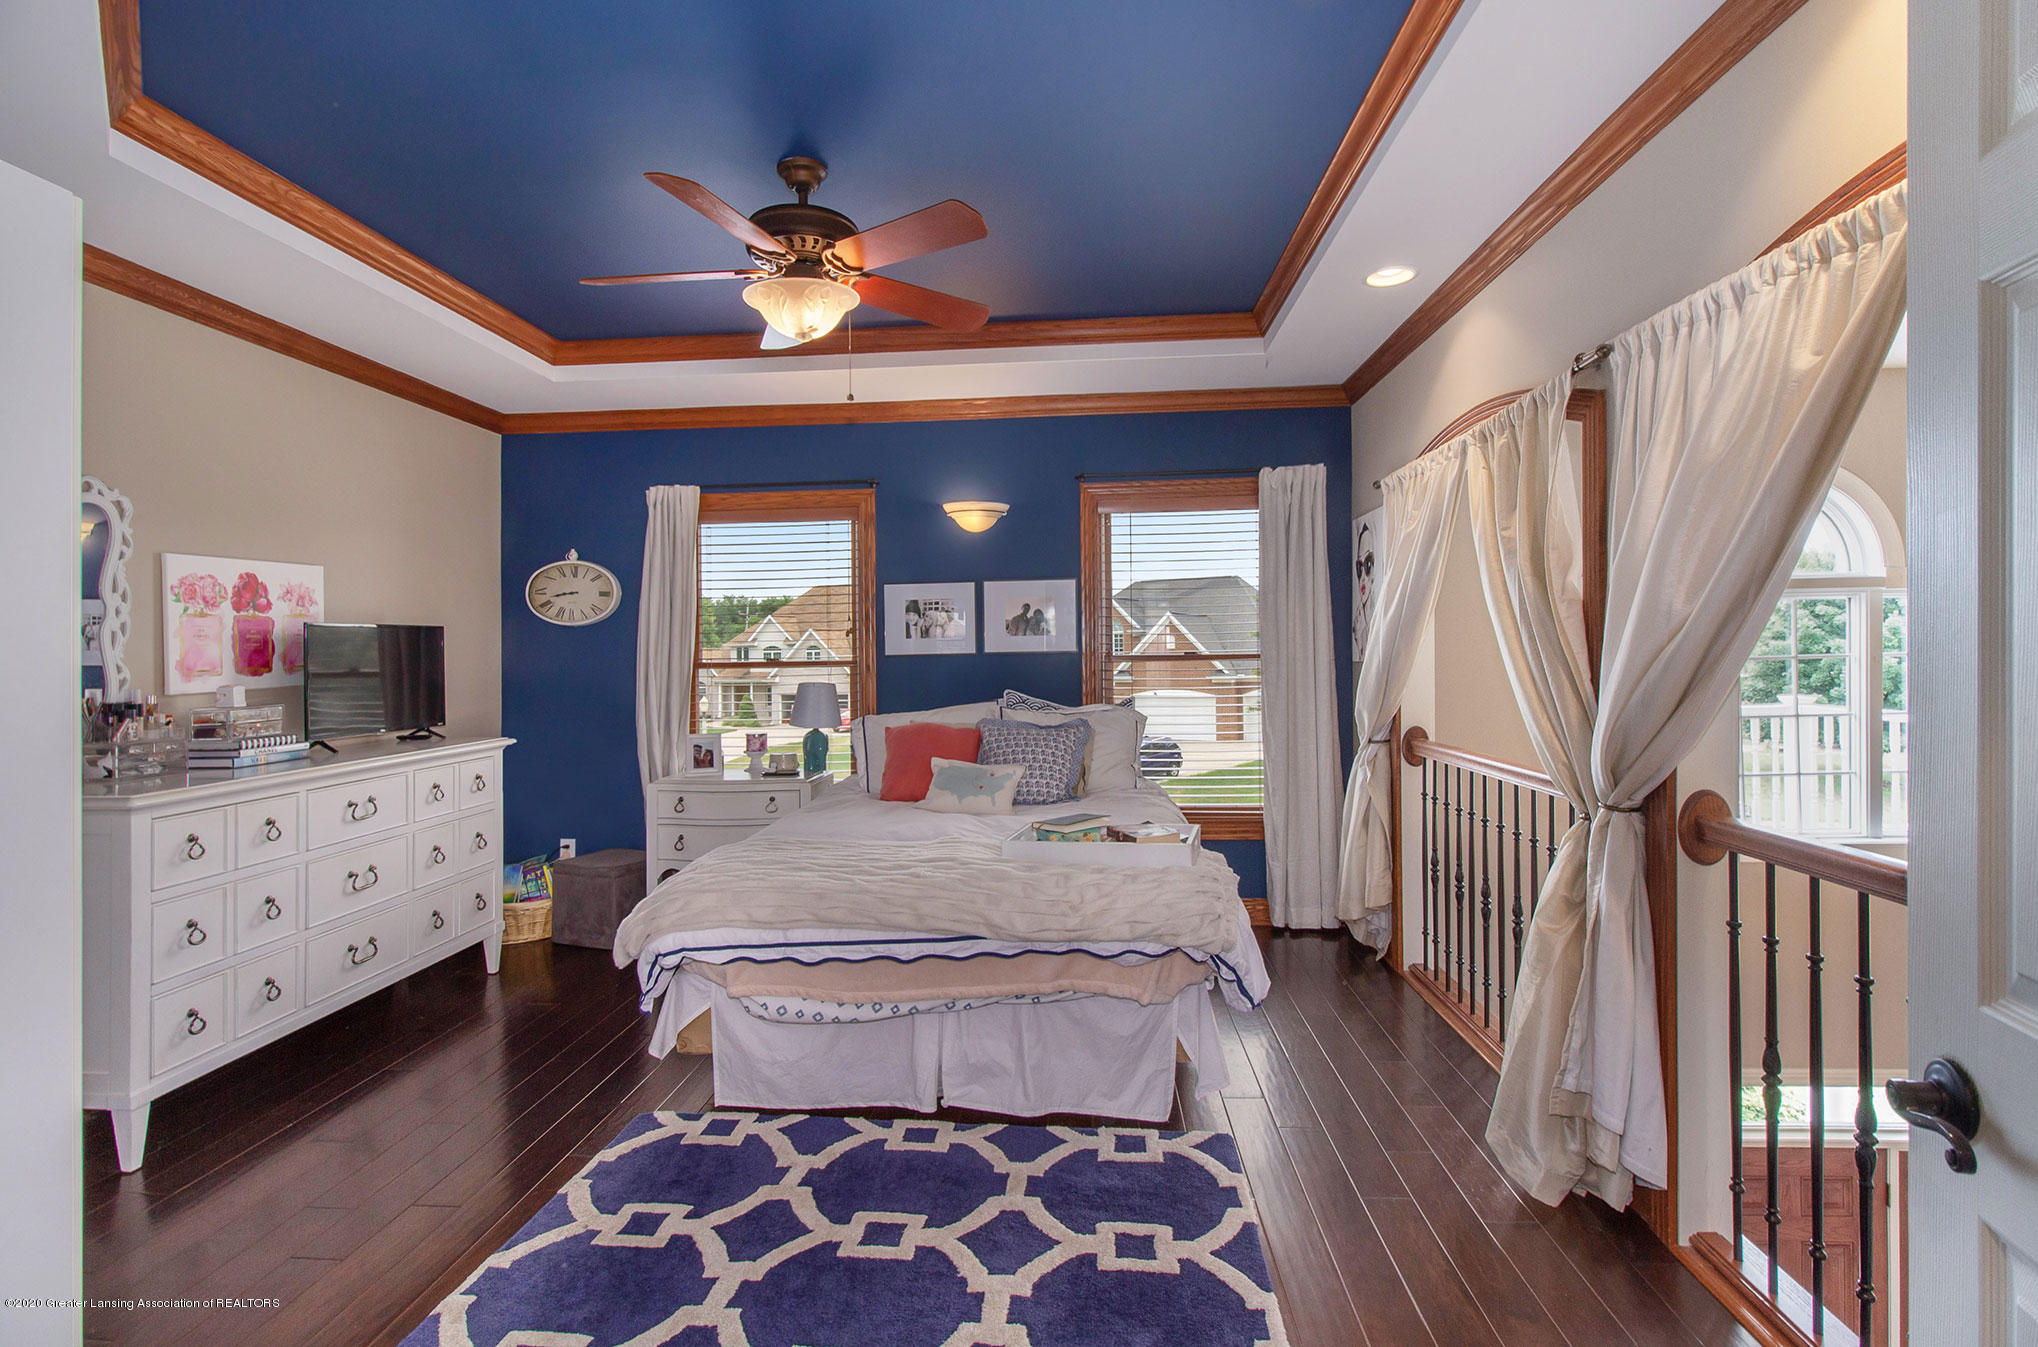 2223 Cawdor Ct - Bedroom with Balcony - 24